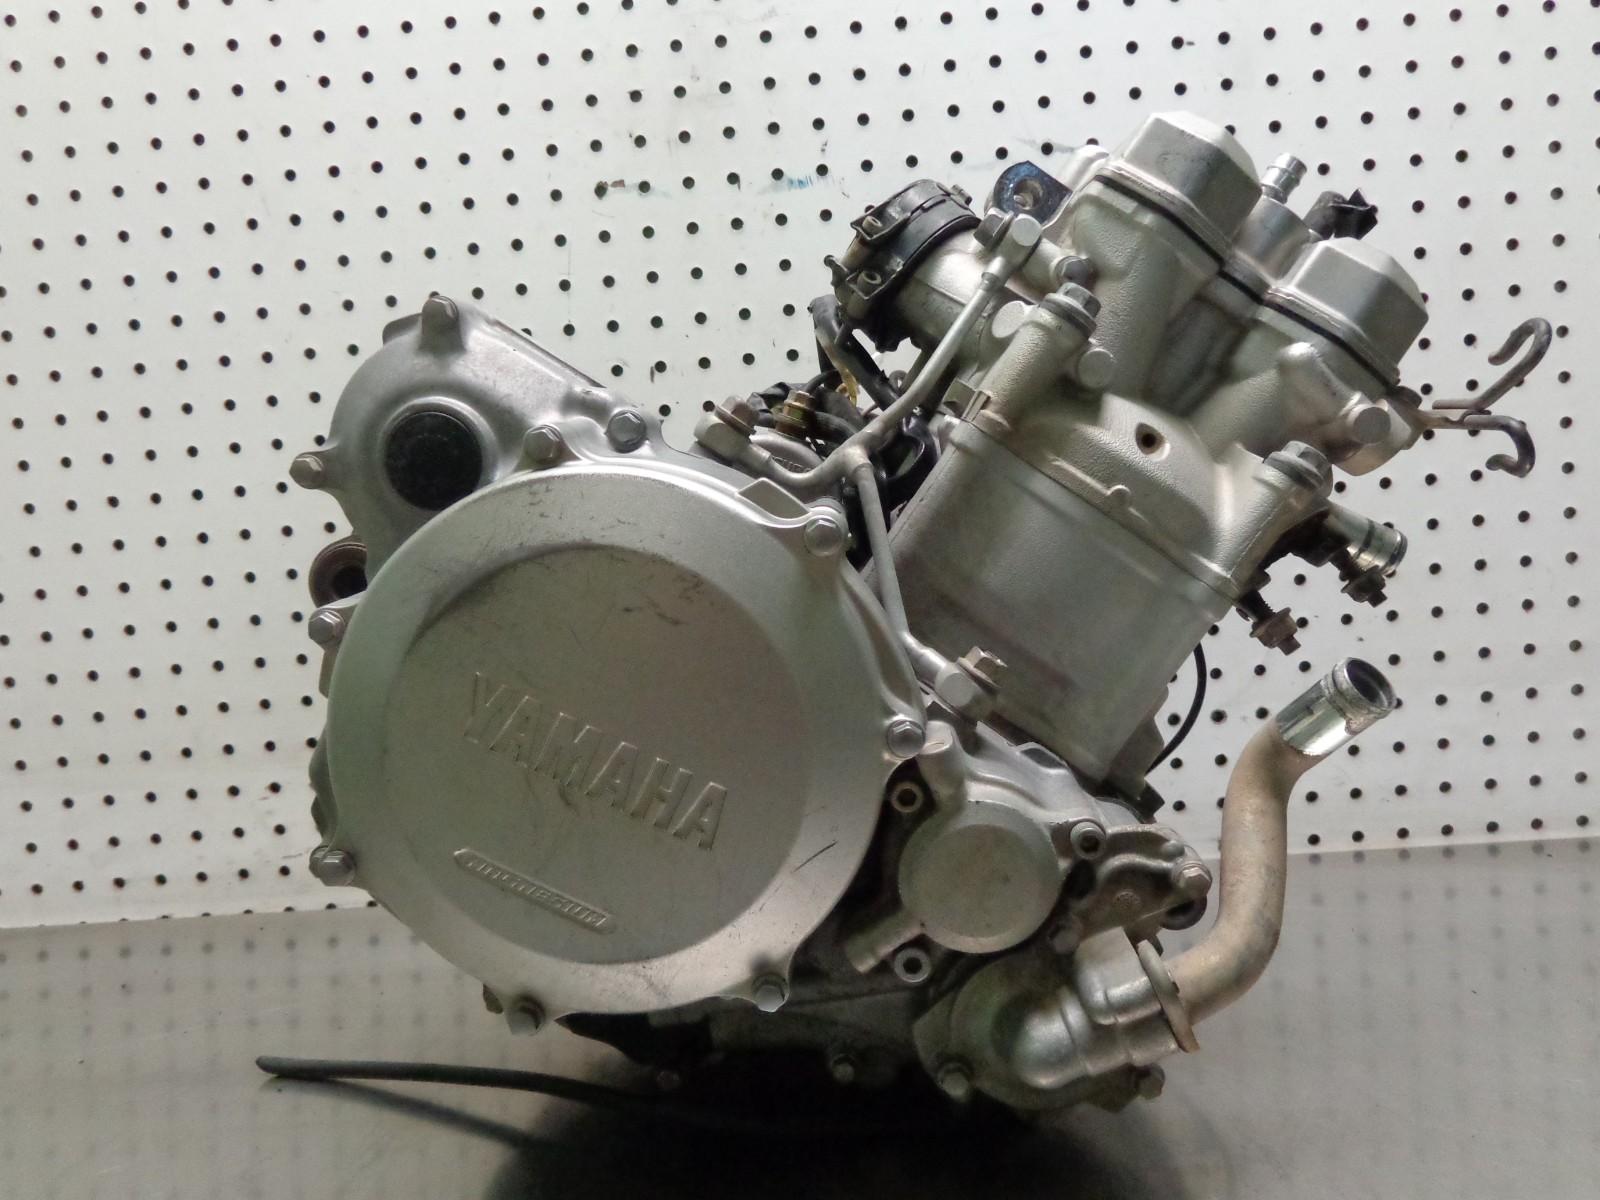 Yamaha Yfz450r Yfz 450 Complete Motor Engine Nice